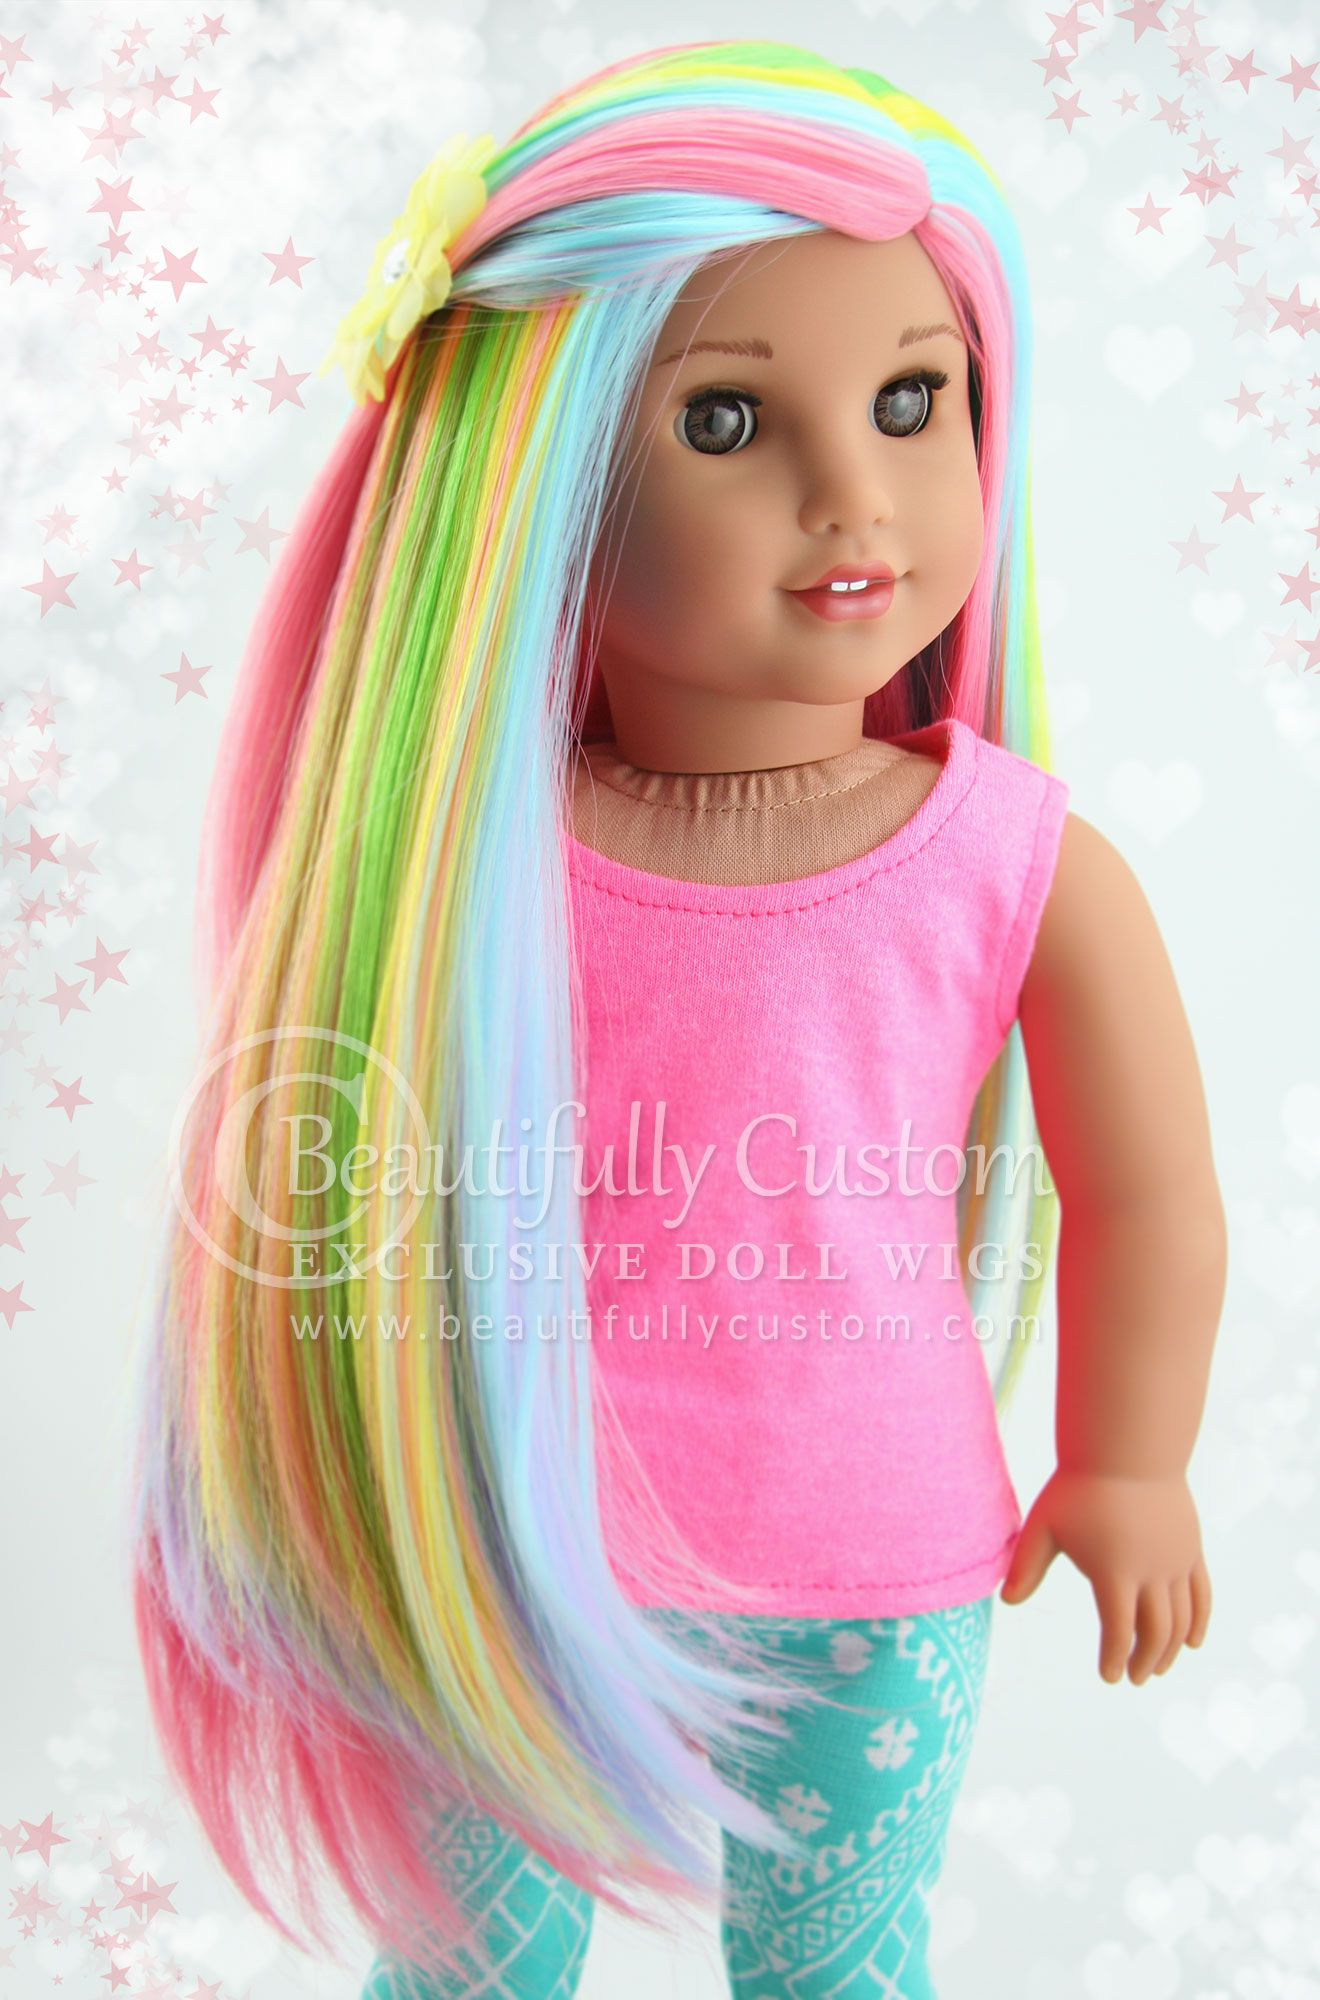 Deluxe Elegance Wig Watercolor Wigs Doll Wigs Elegant